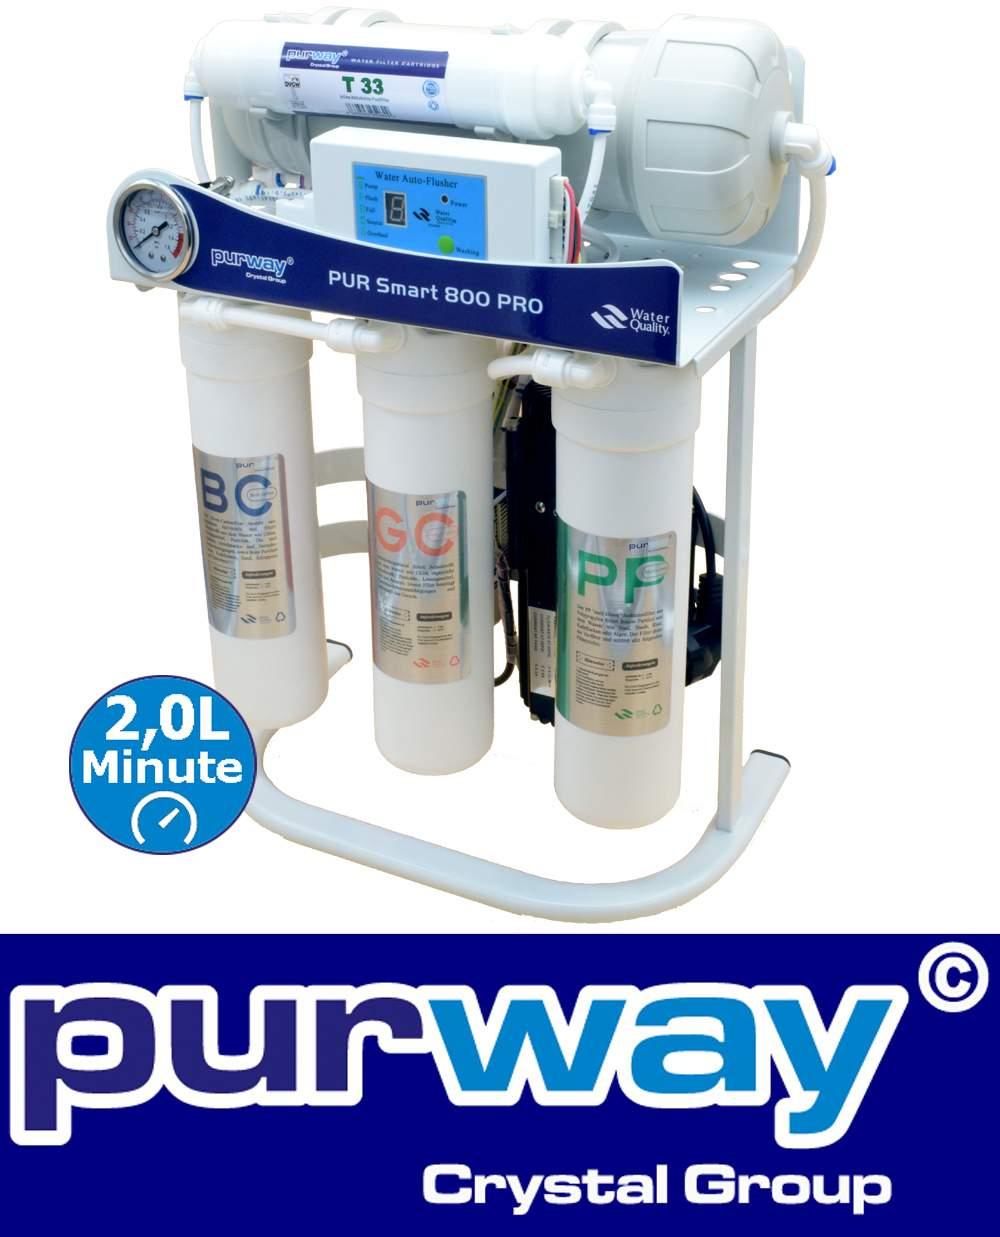 PUR Smart 800 PRO Umkehrosmoseanlage brushless bürstenlos tanklos